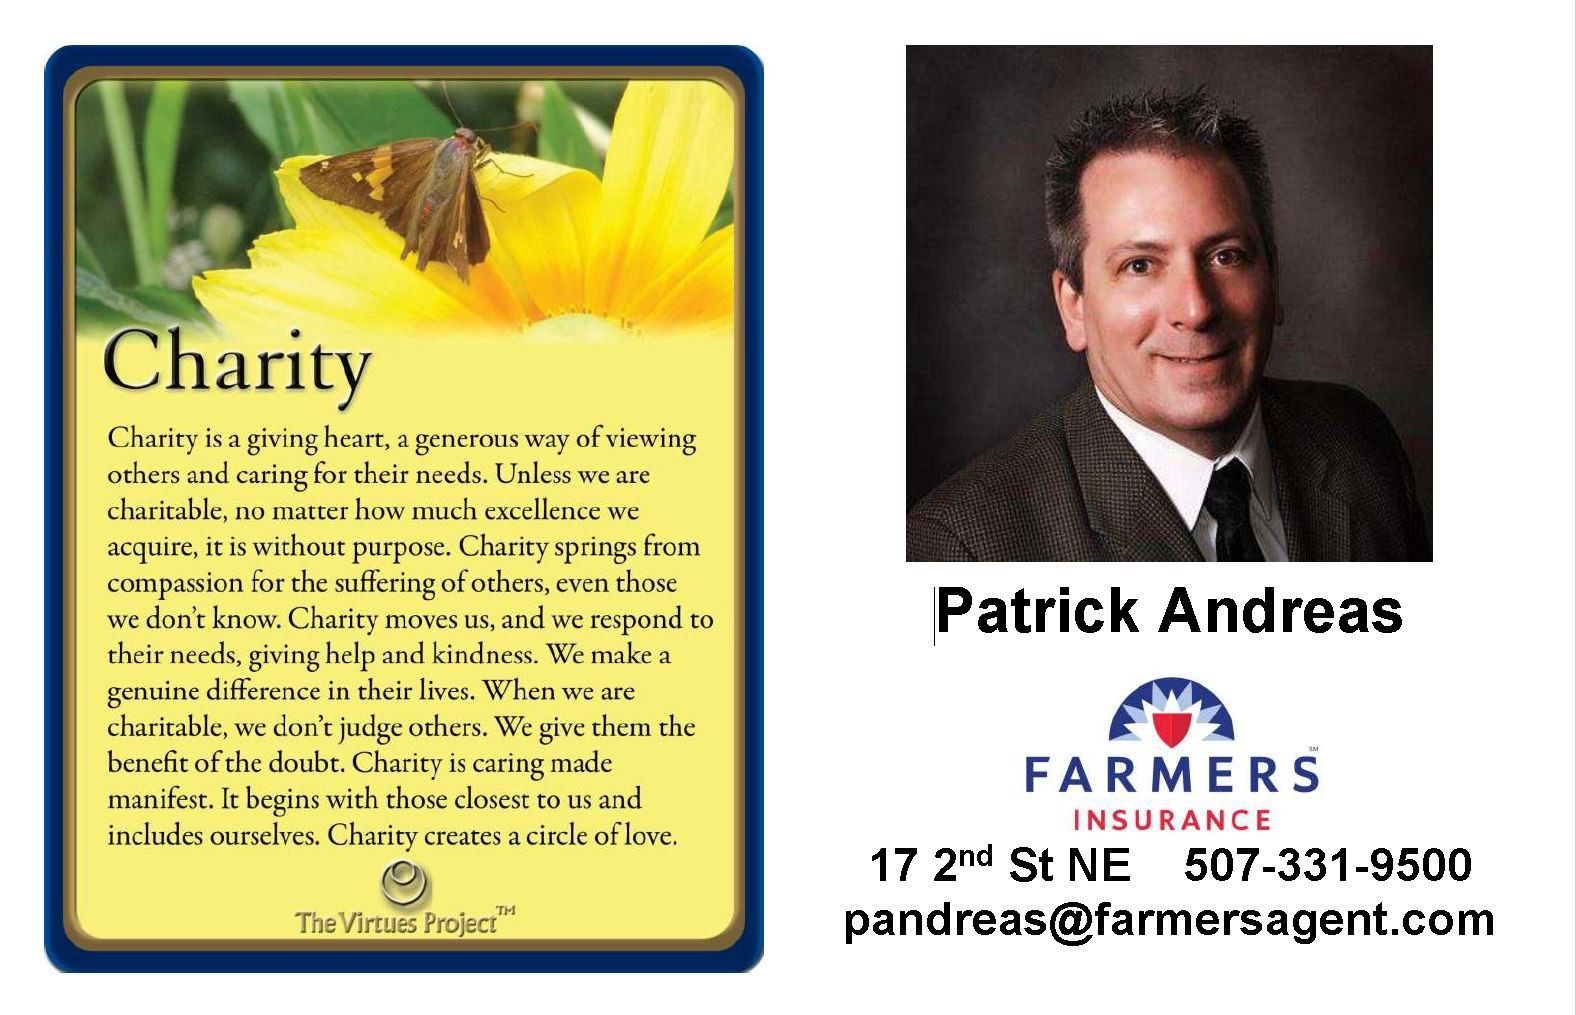 Farmers Ins Charity.JPG